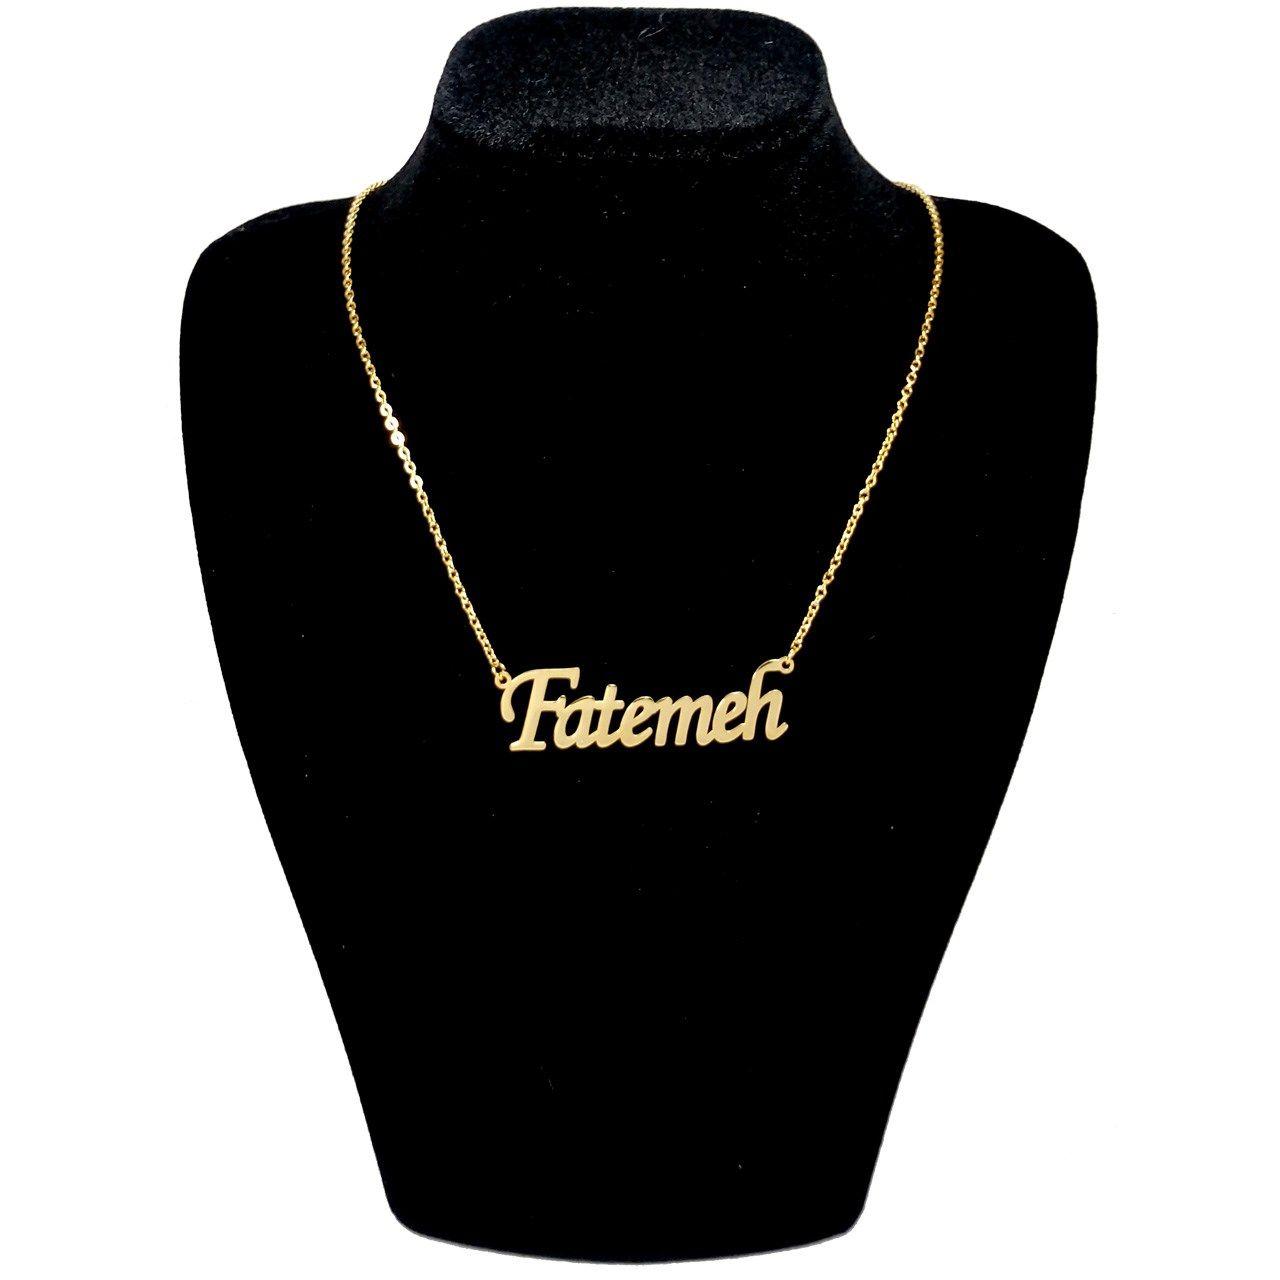 گردنبند آی جواهر طرح اسم فاطمه انگلیسی کد ge1100107 -  - 1